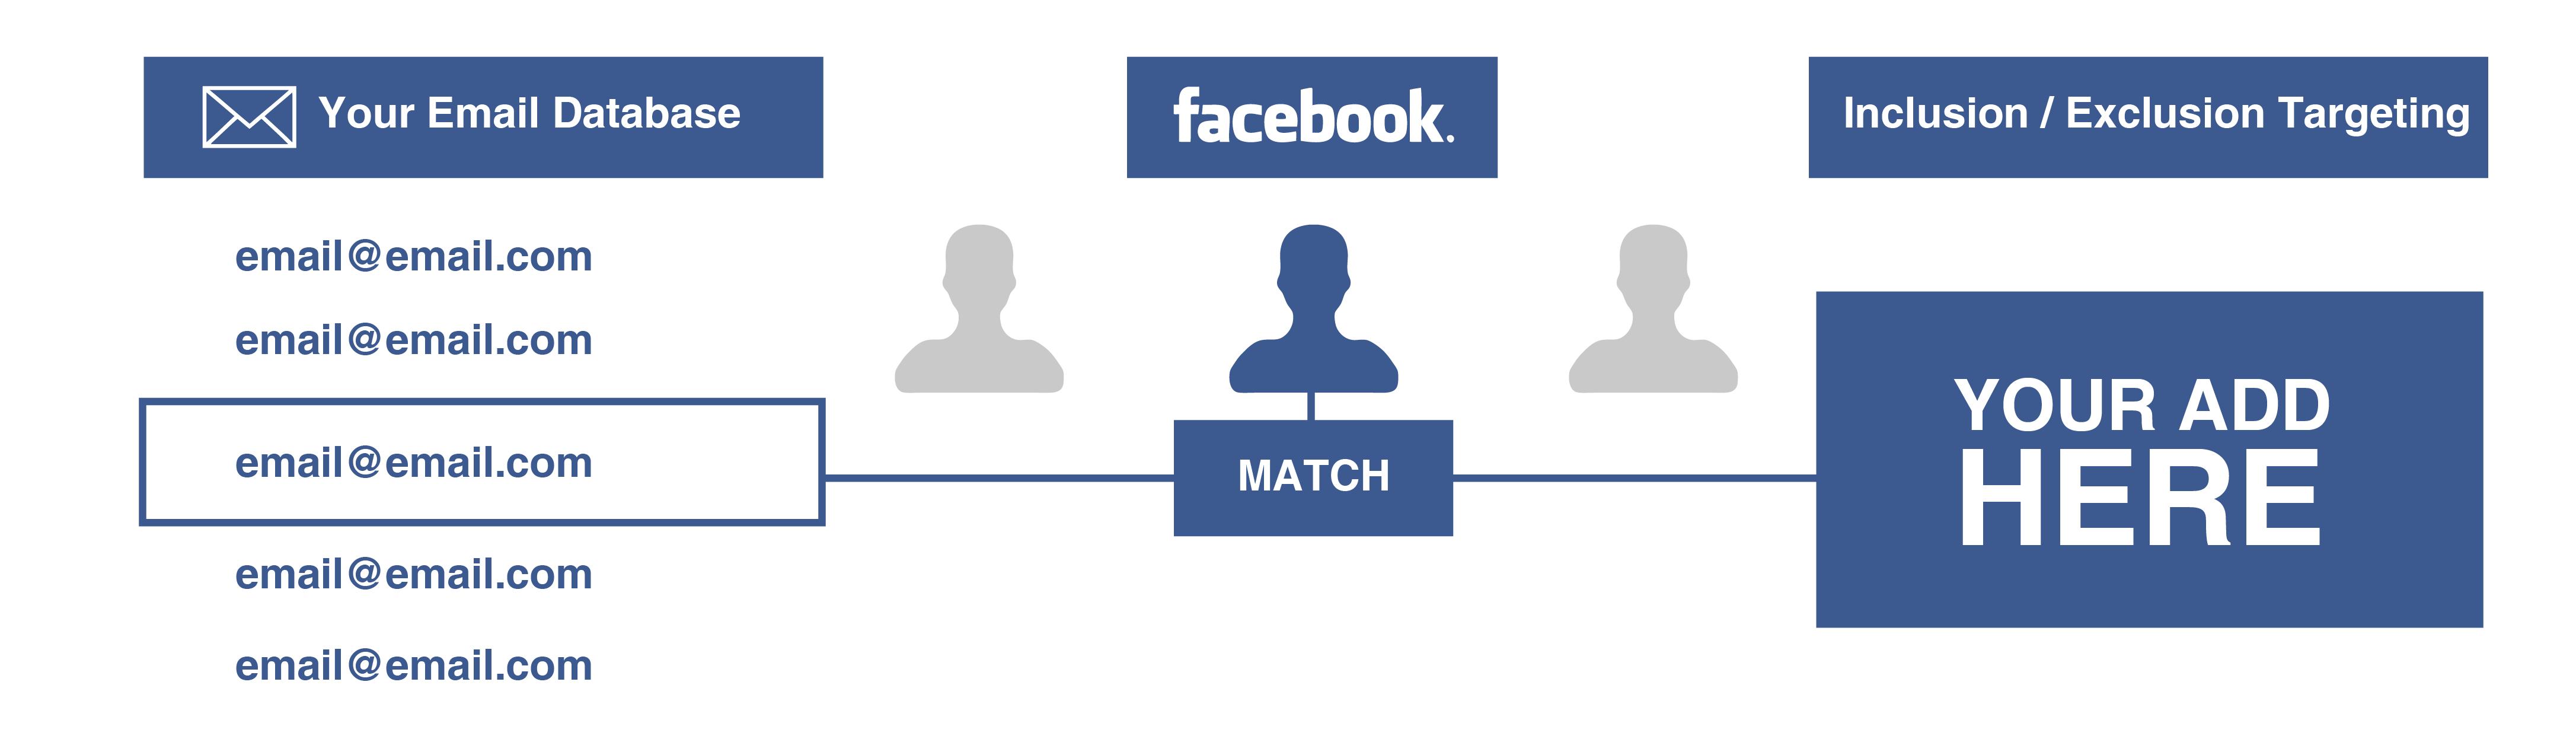 Remarketing Facebook Ads Email eStudio34